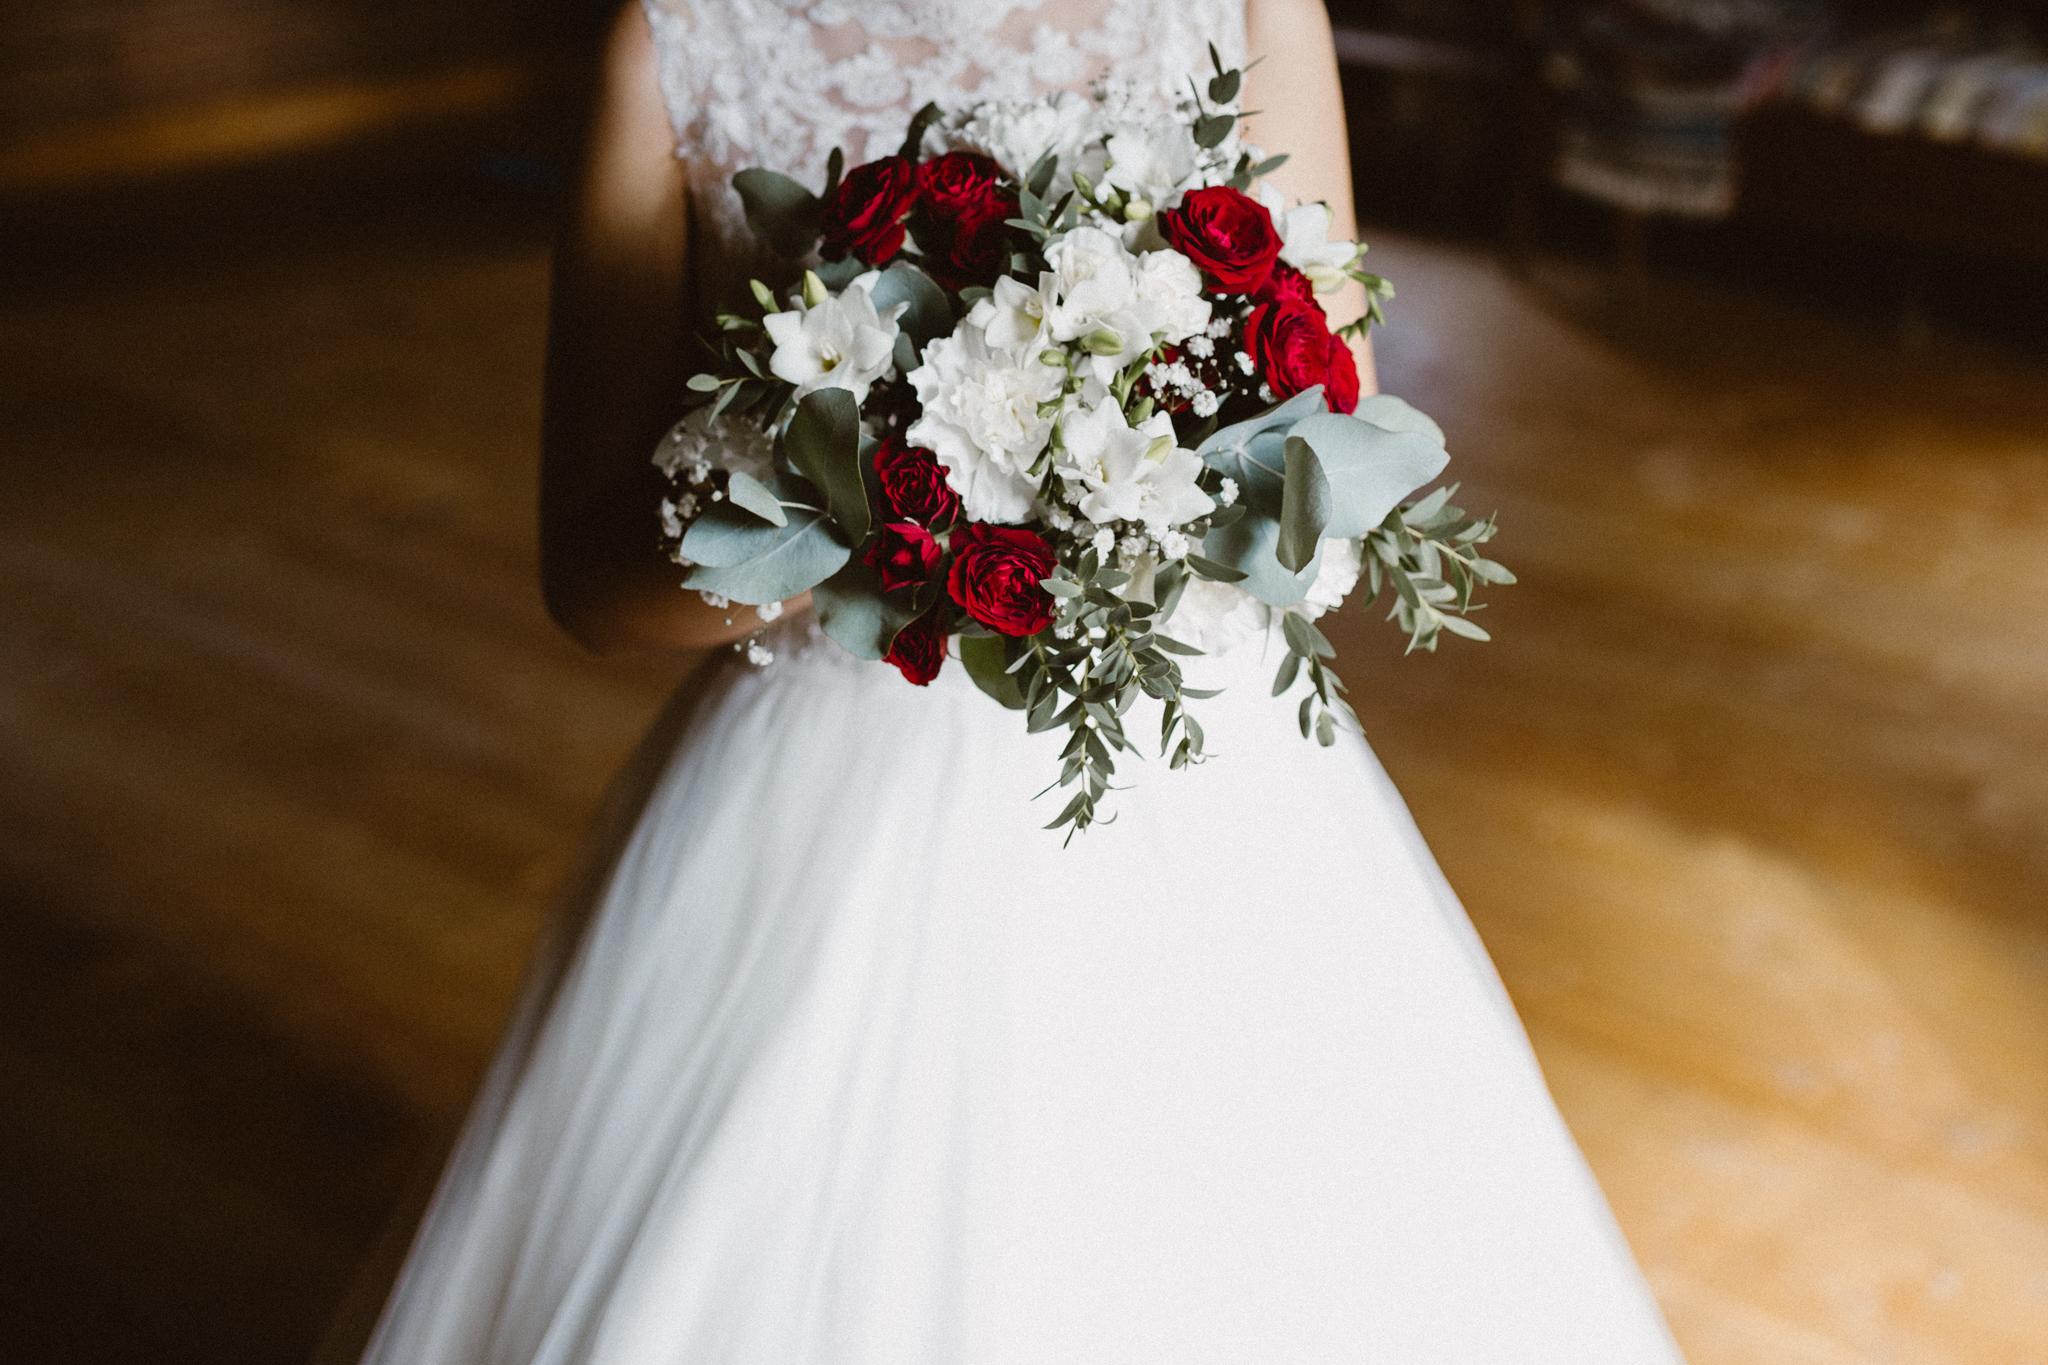 Leevi + Susanna -- Patrick Karkkolainen Wedding Photographer-117.jpg